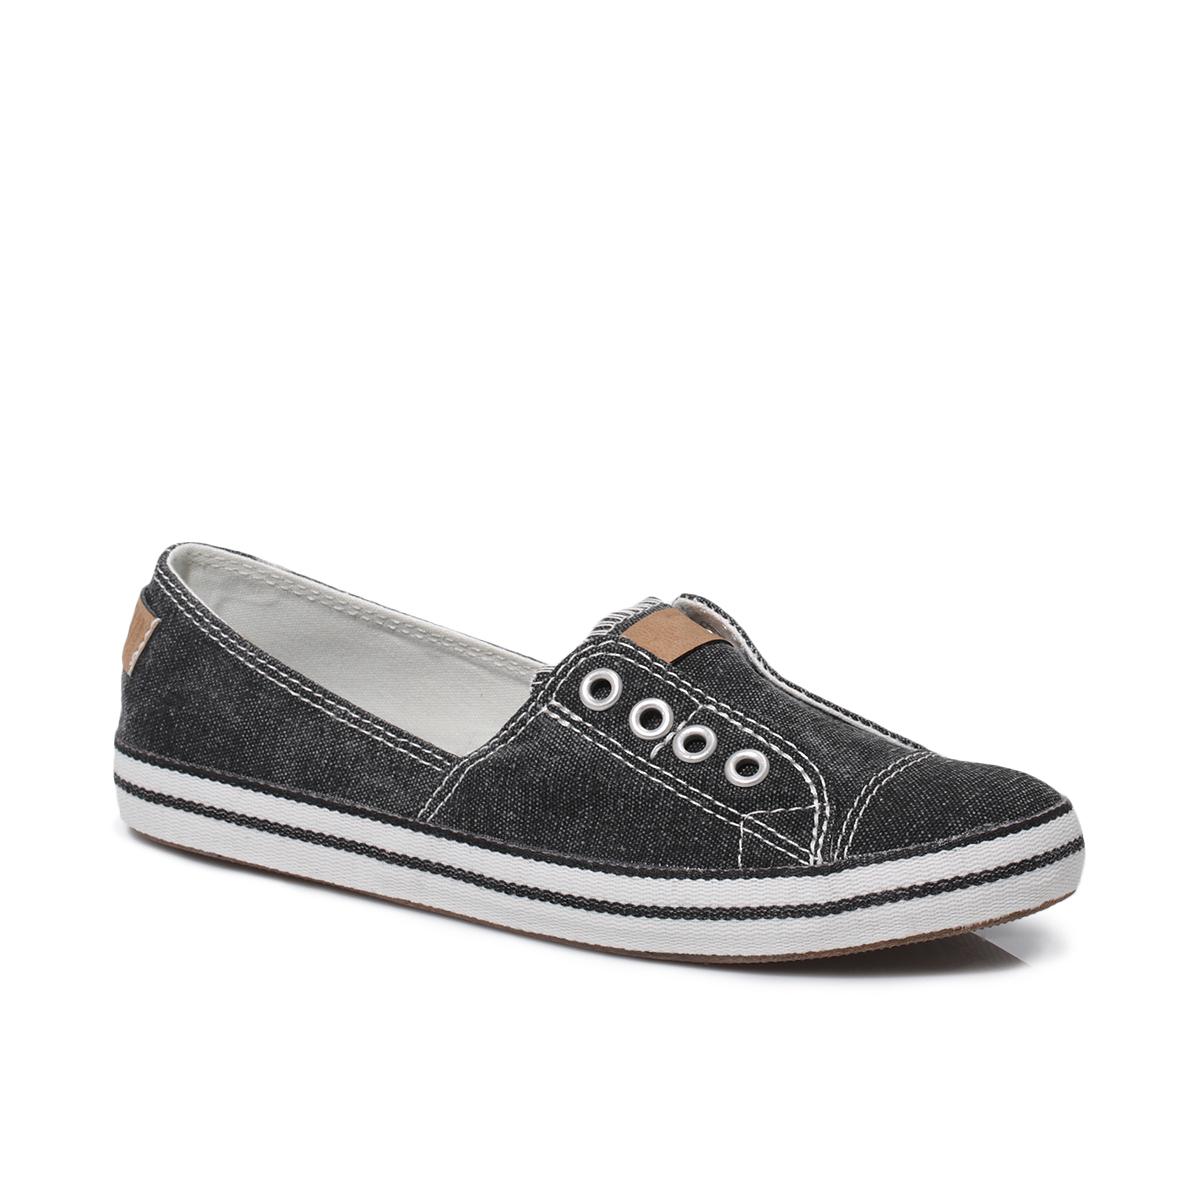 Converse All Stars Black Espadrille Slip On Womens Canvas Shoes Size 3-8 | EBay